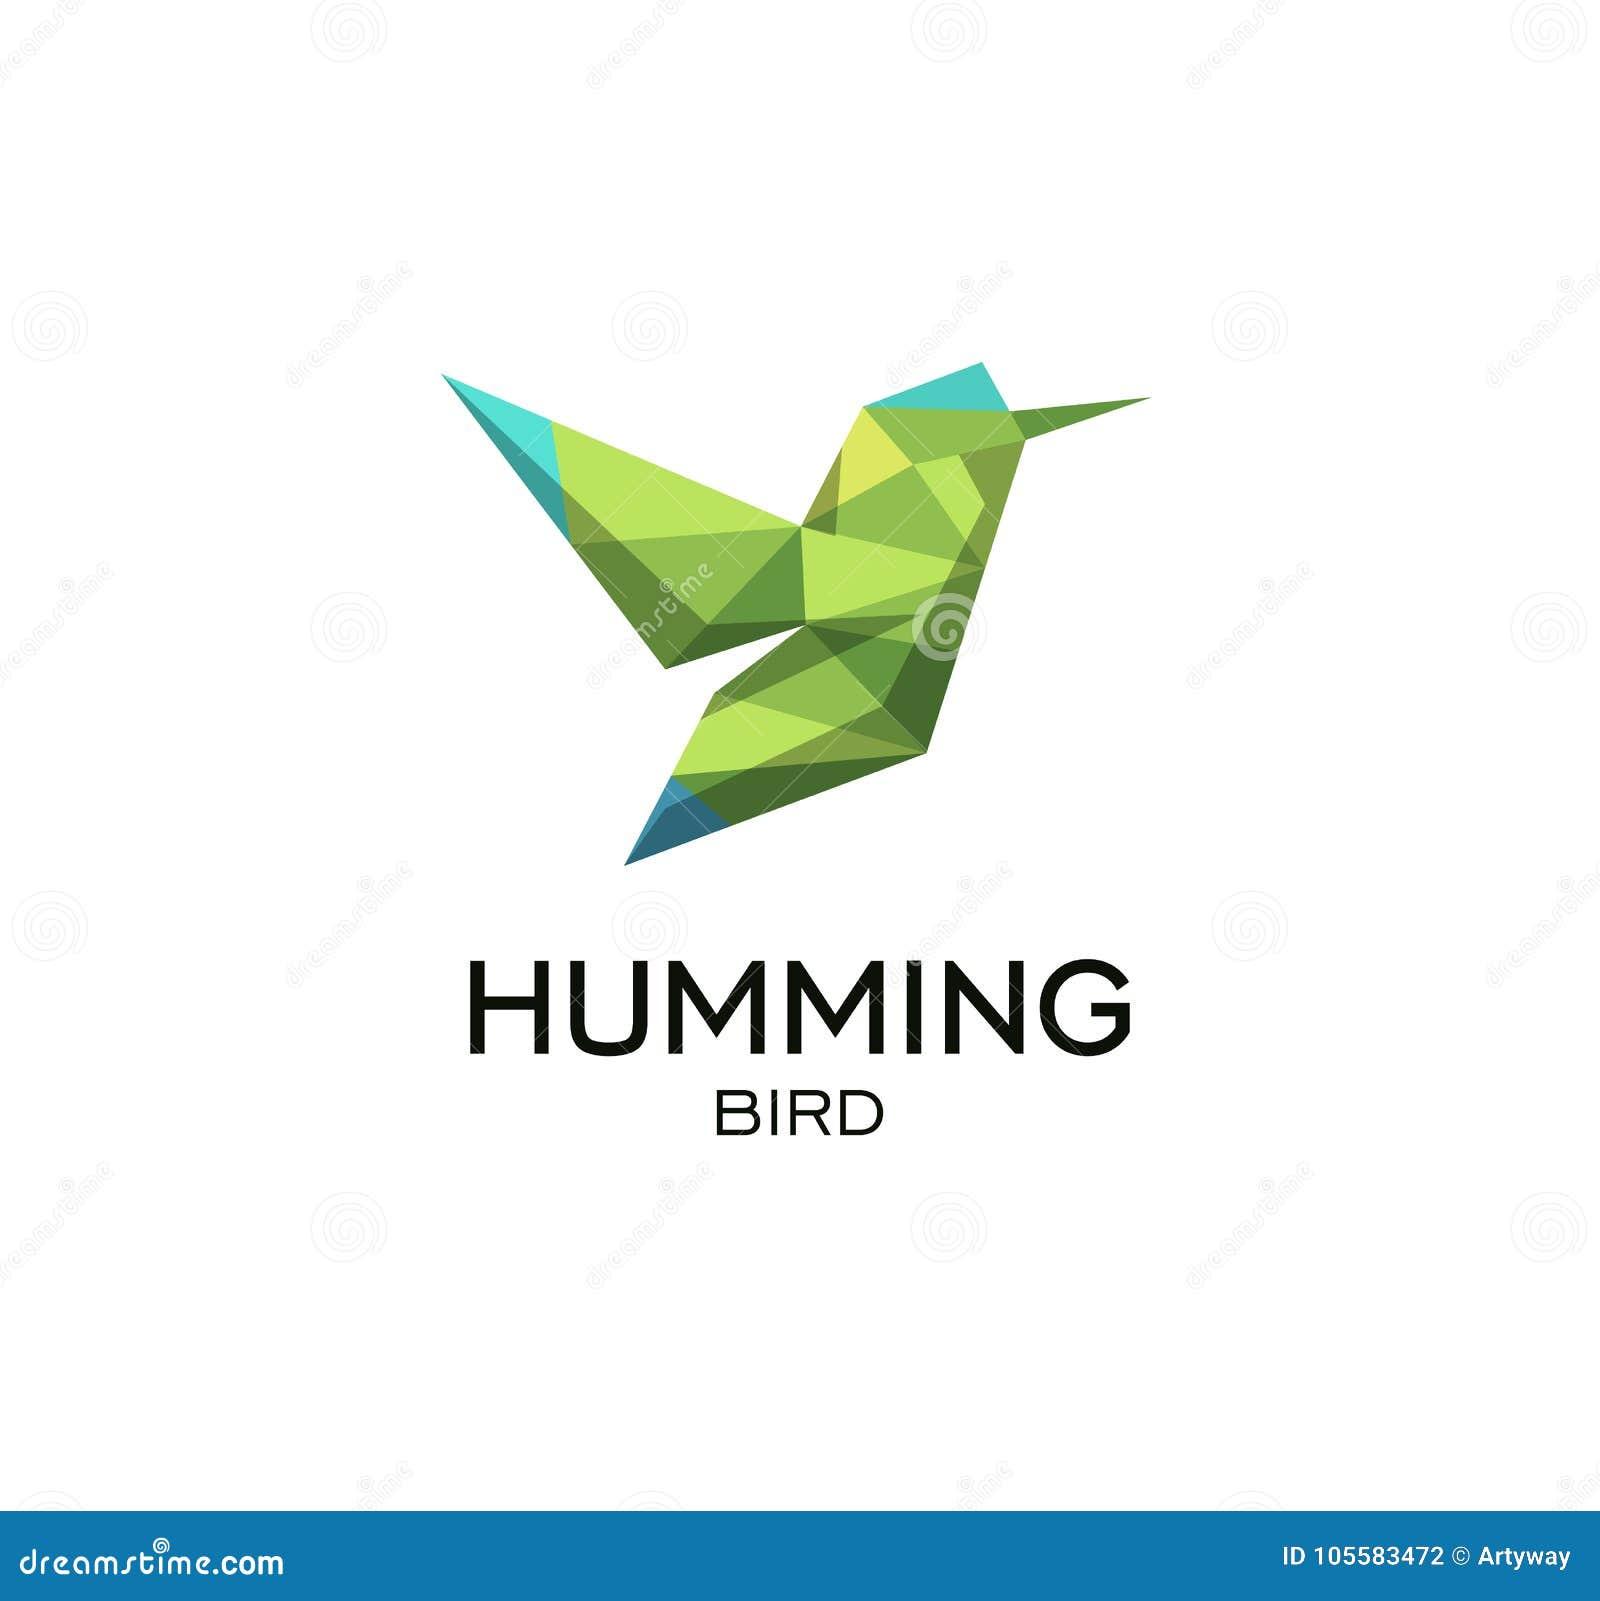 Hummig鸟几何标志, calibri抽象多角形传染媒介商标模板 低Origami绿色多野生动物